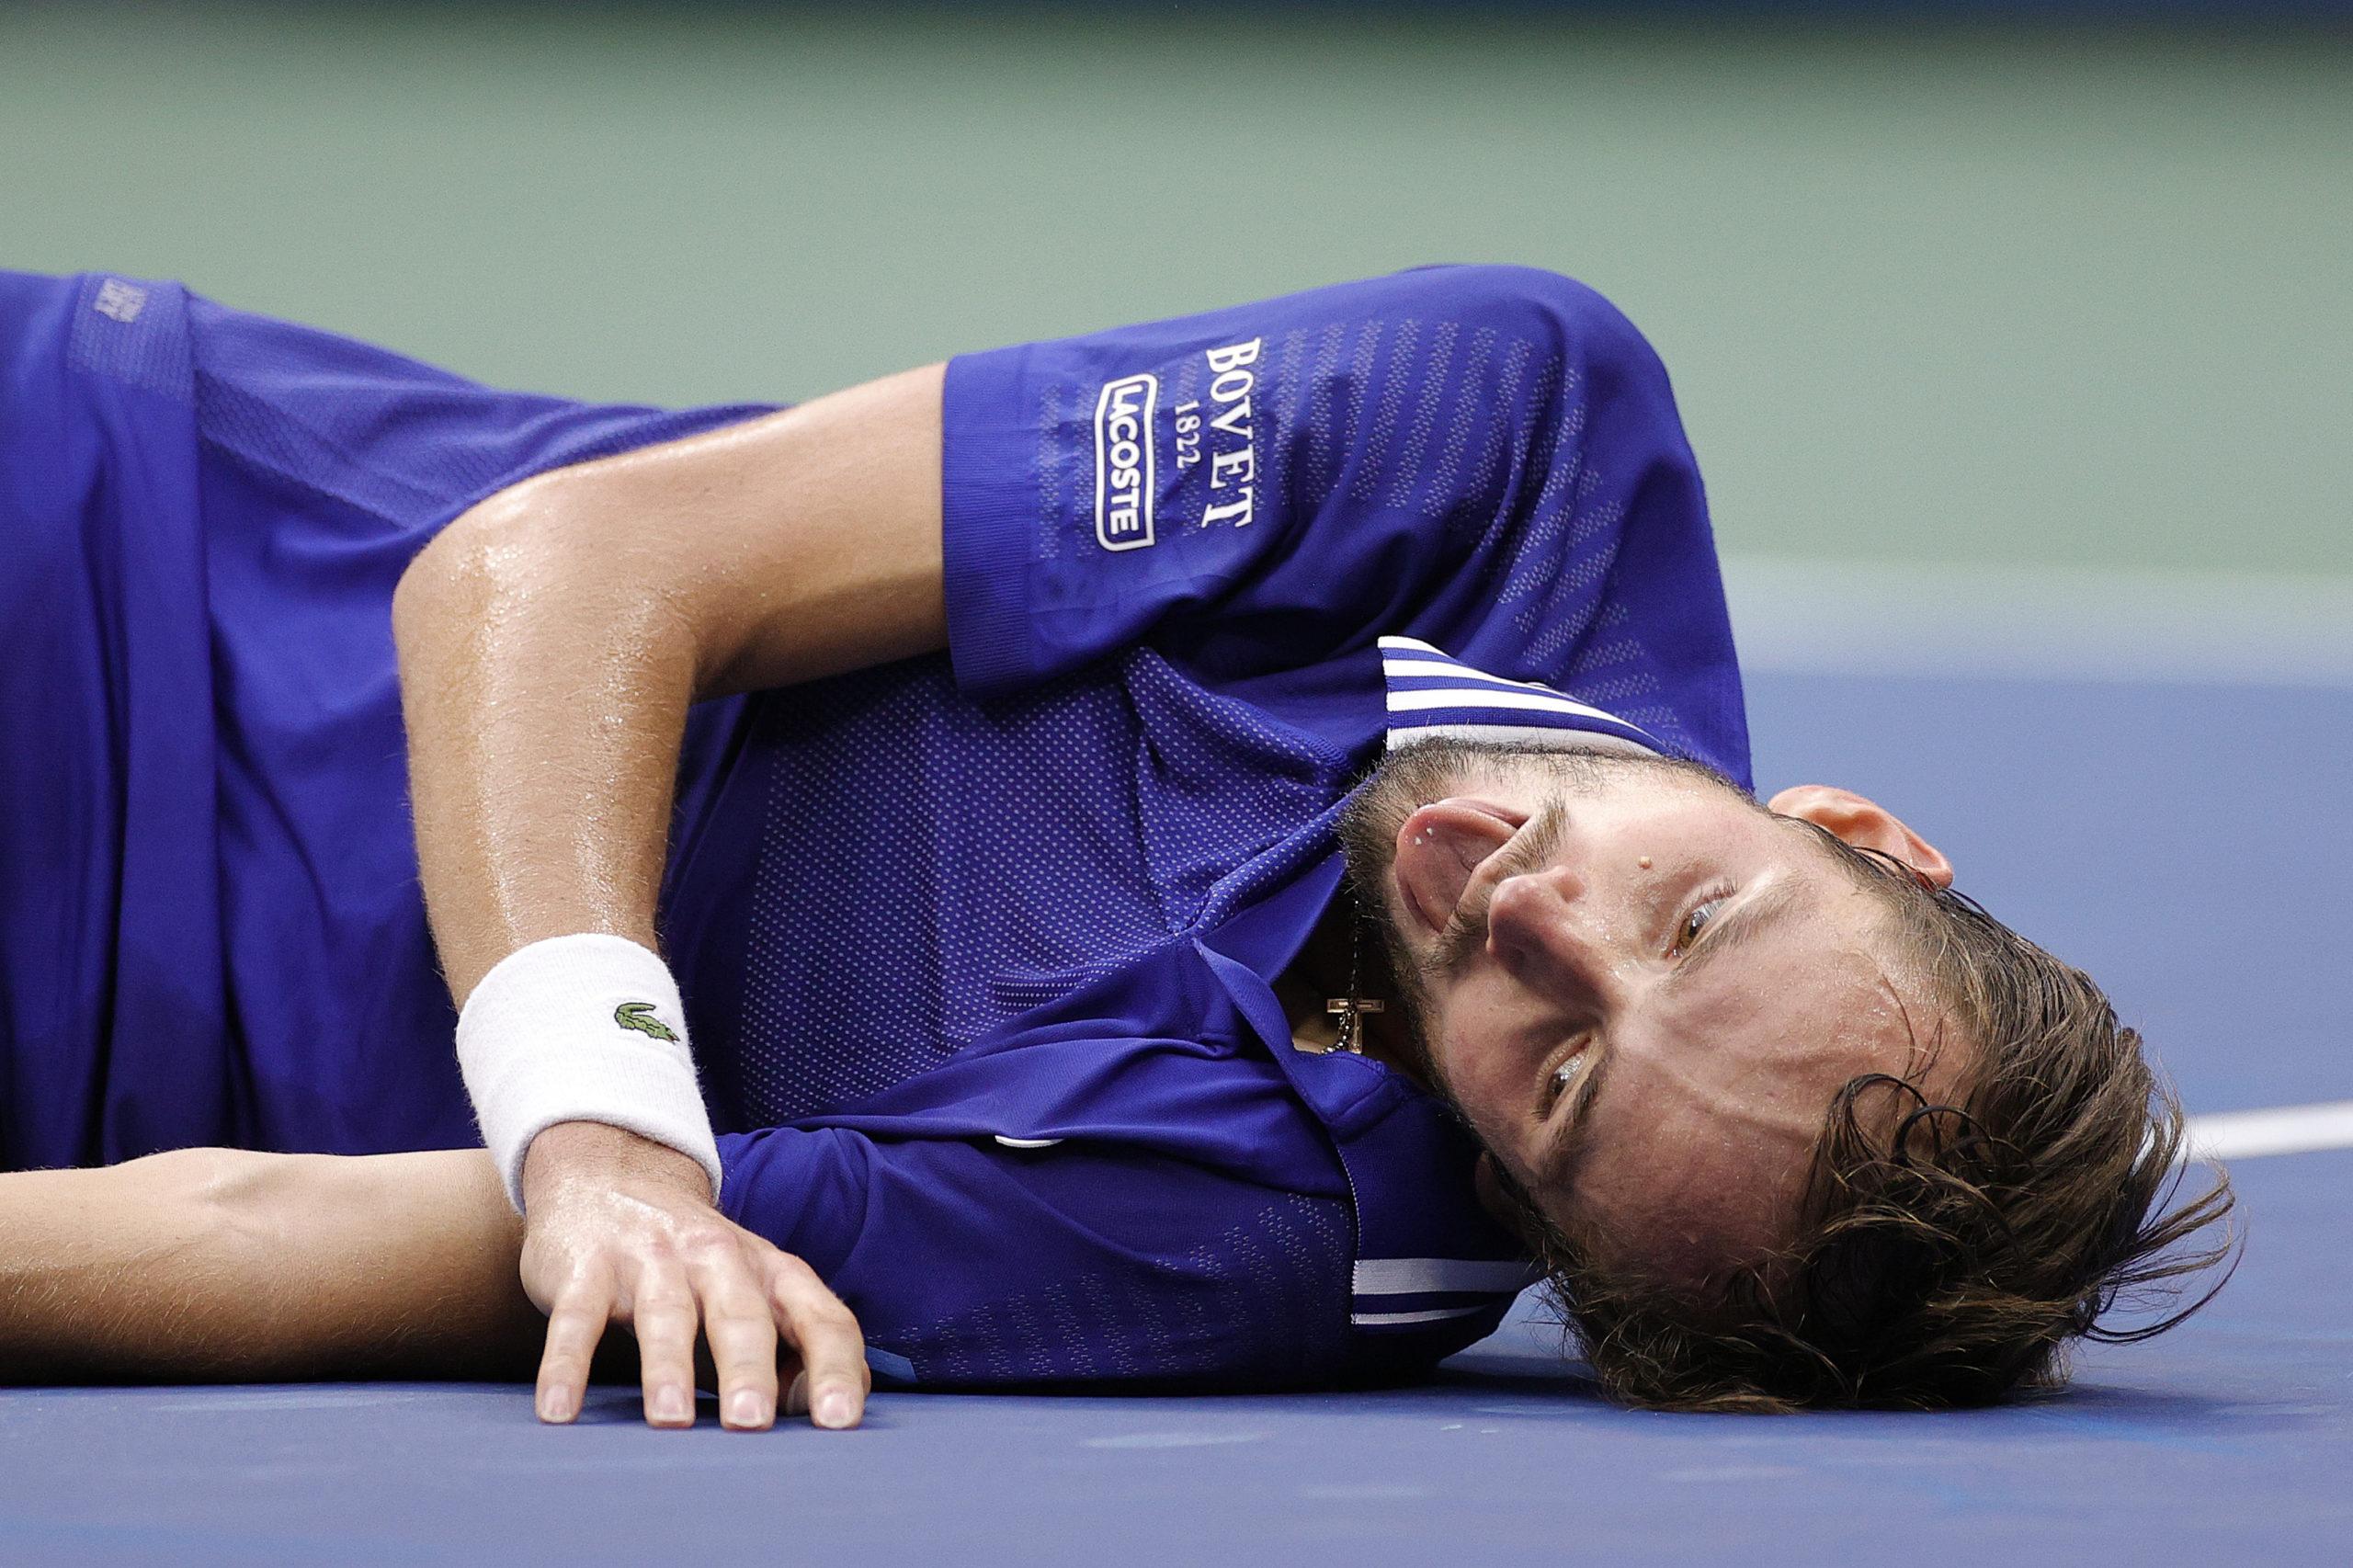 Medvedev se consagró campeón del US Open | Canal Showsport